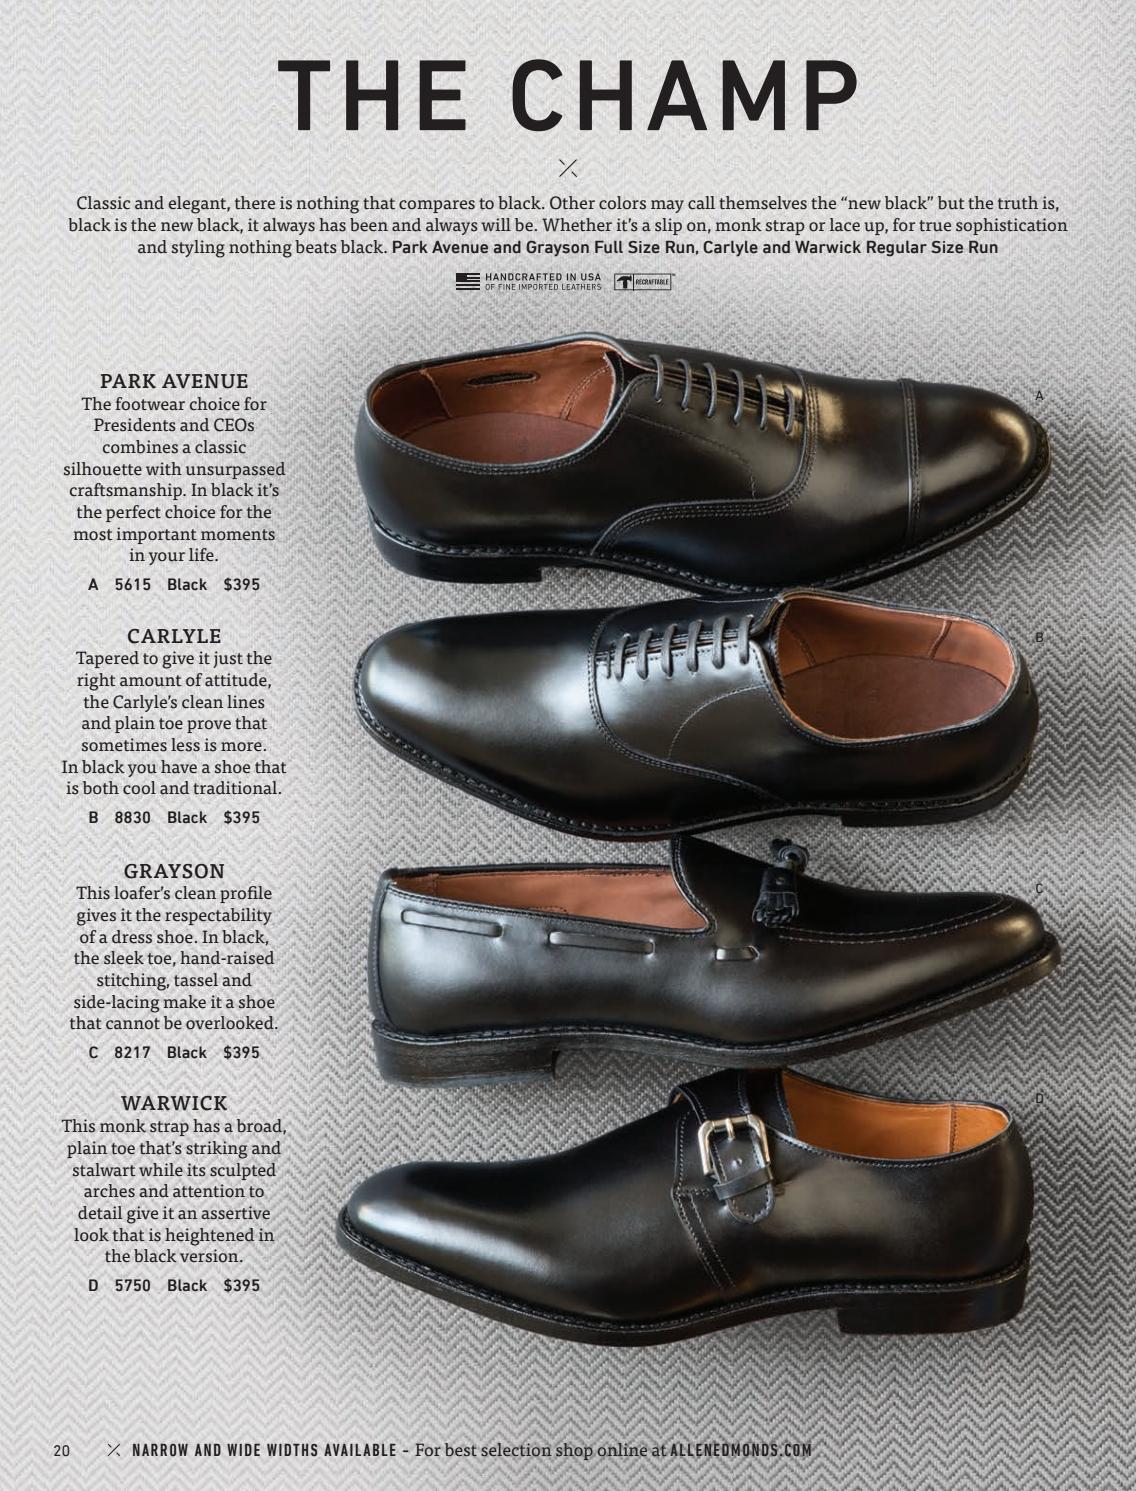 7c4f50efd72 2016 Allen Edmonds Holiday I Catalog by Allen Edmonds Shoe ...